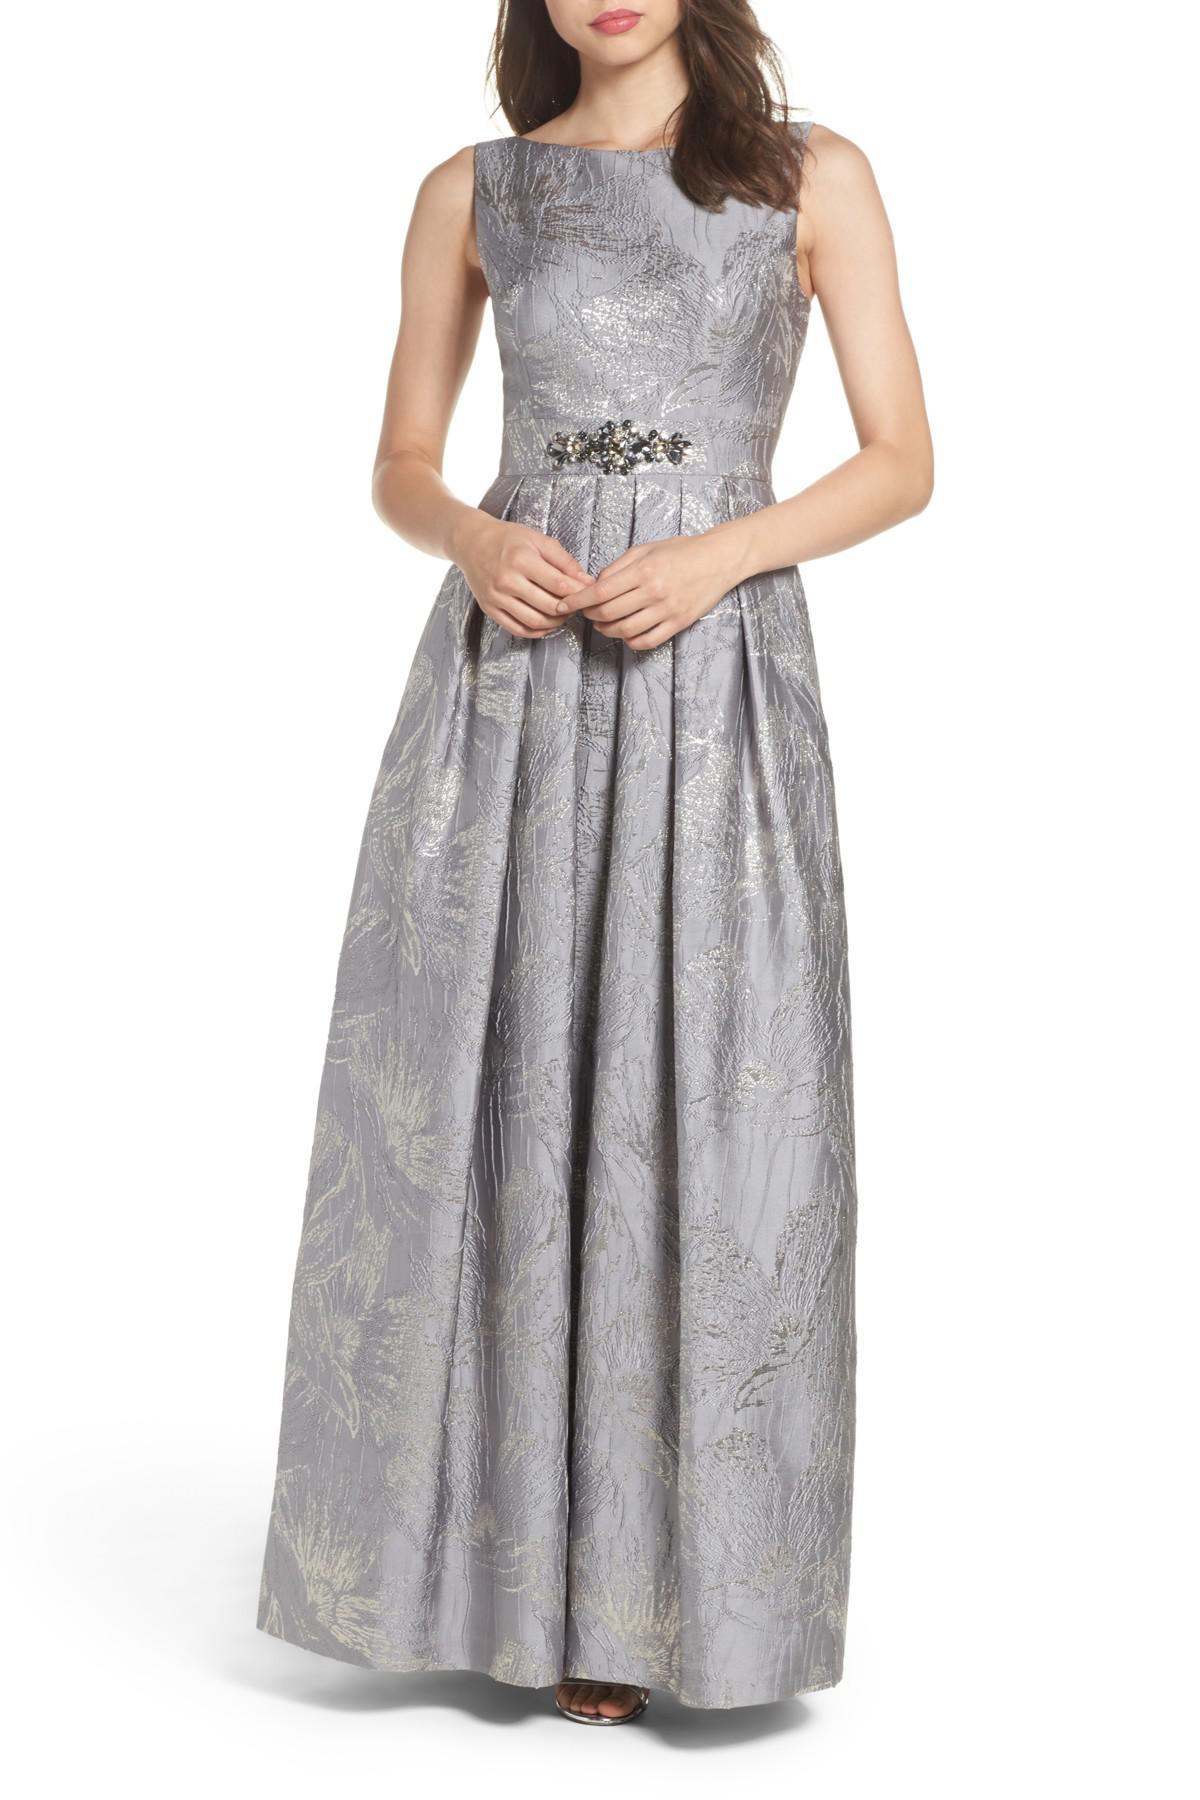 Lyst - Eliza J Embellished Brocade Ballgown in Metallic